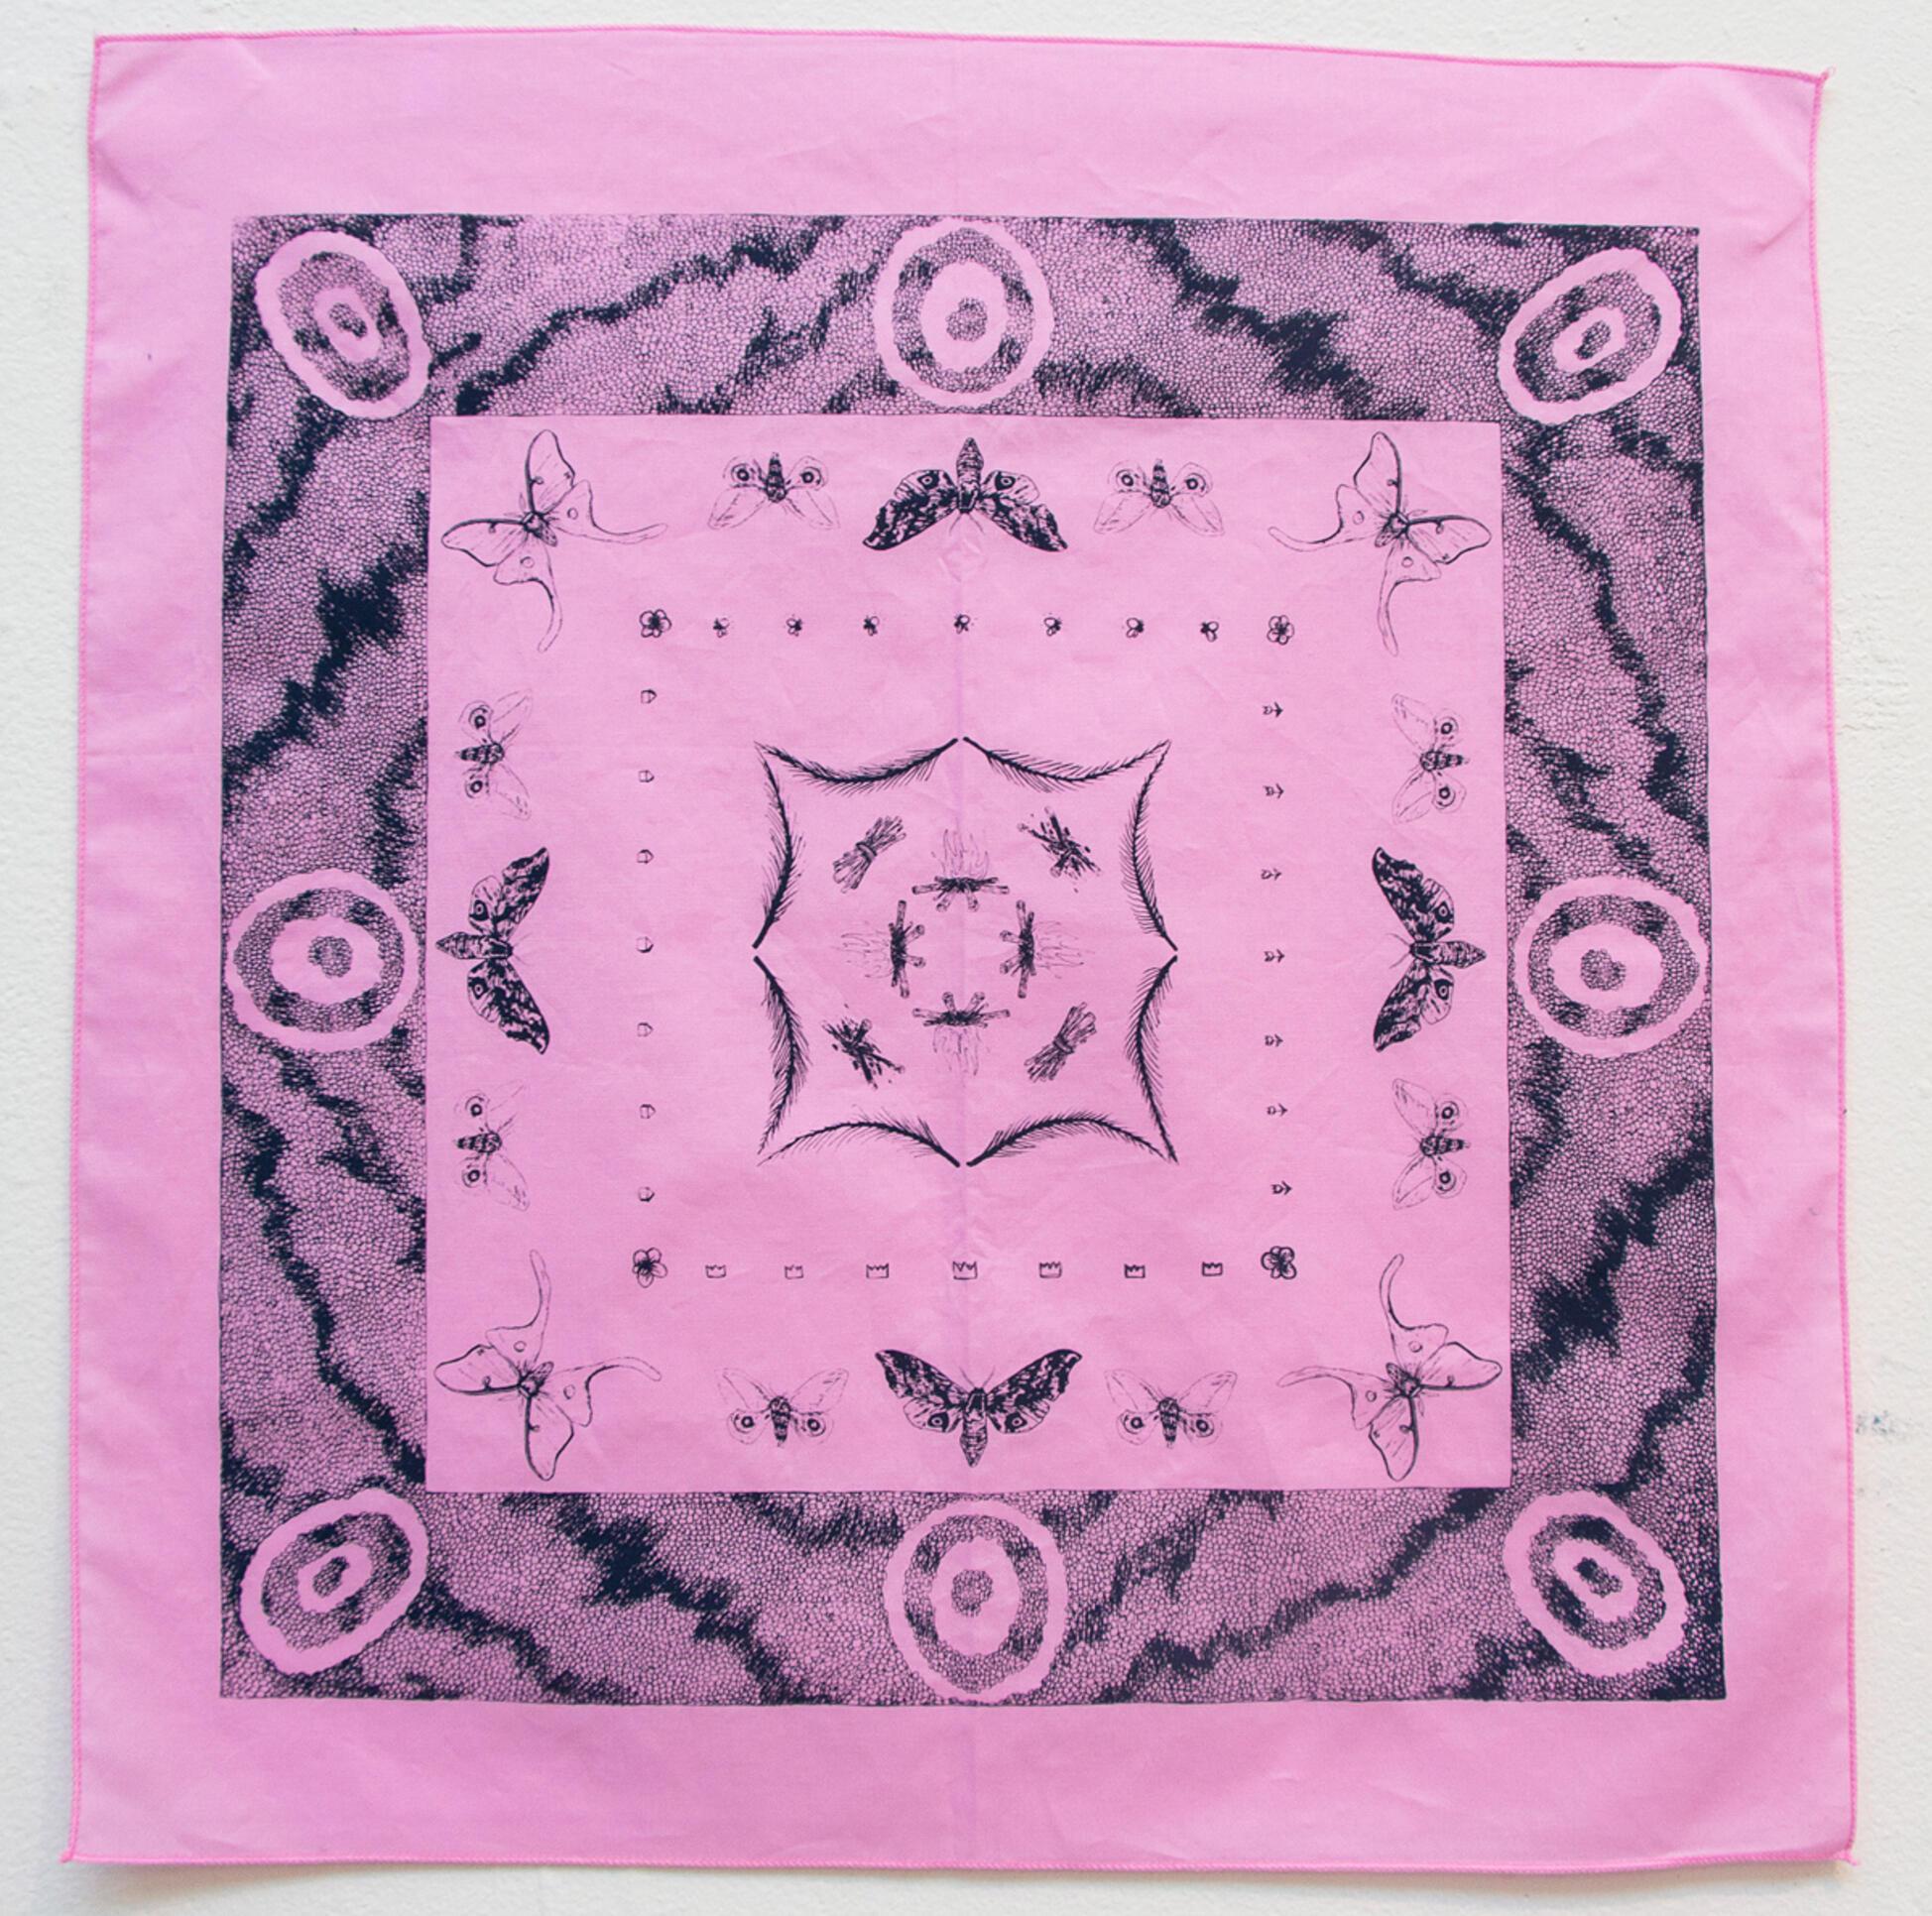 Abstract fabric pattern work ; Tuli Troiani